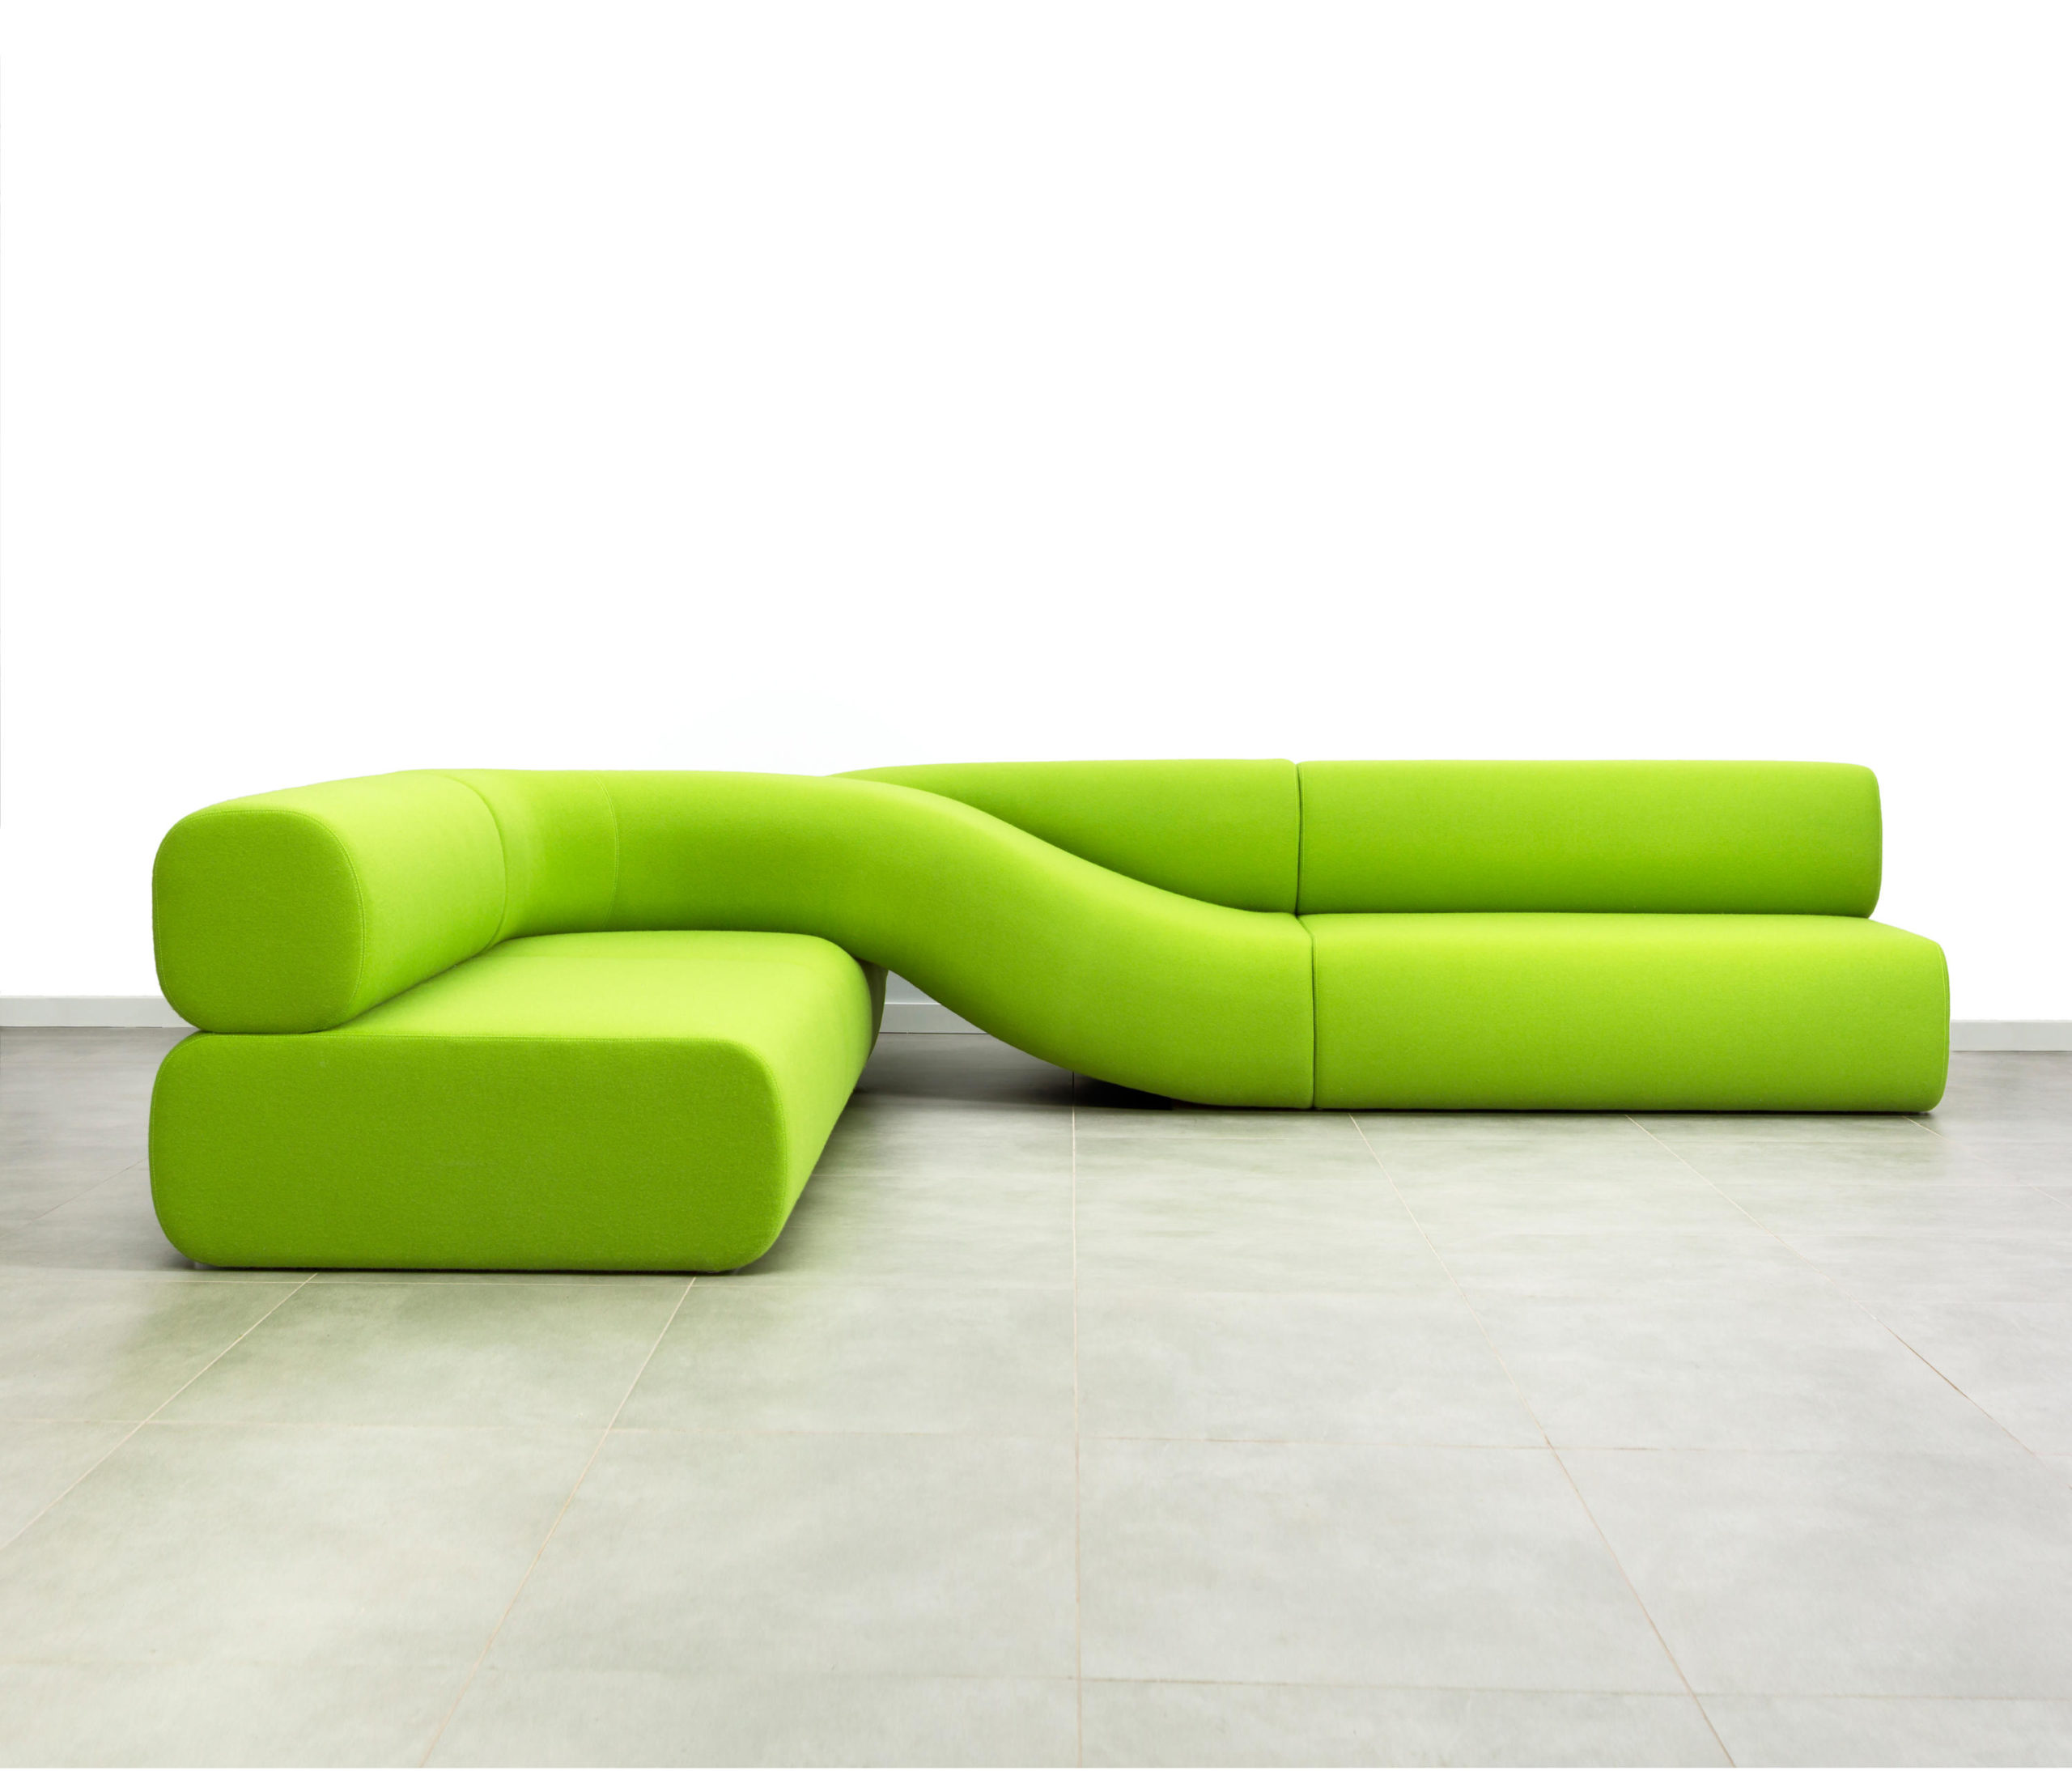 Curvy Sofa by Dune Furniture